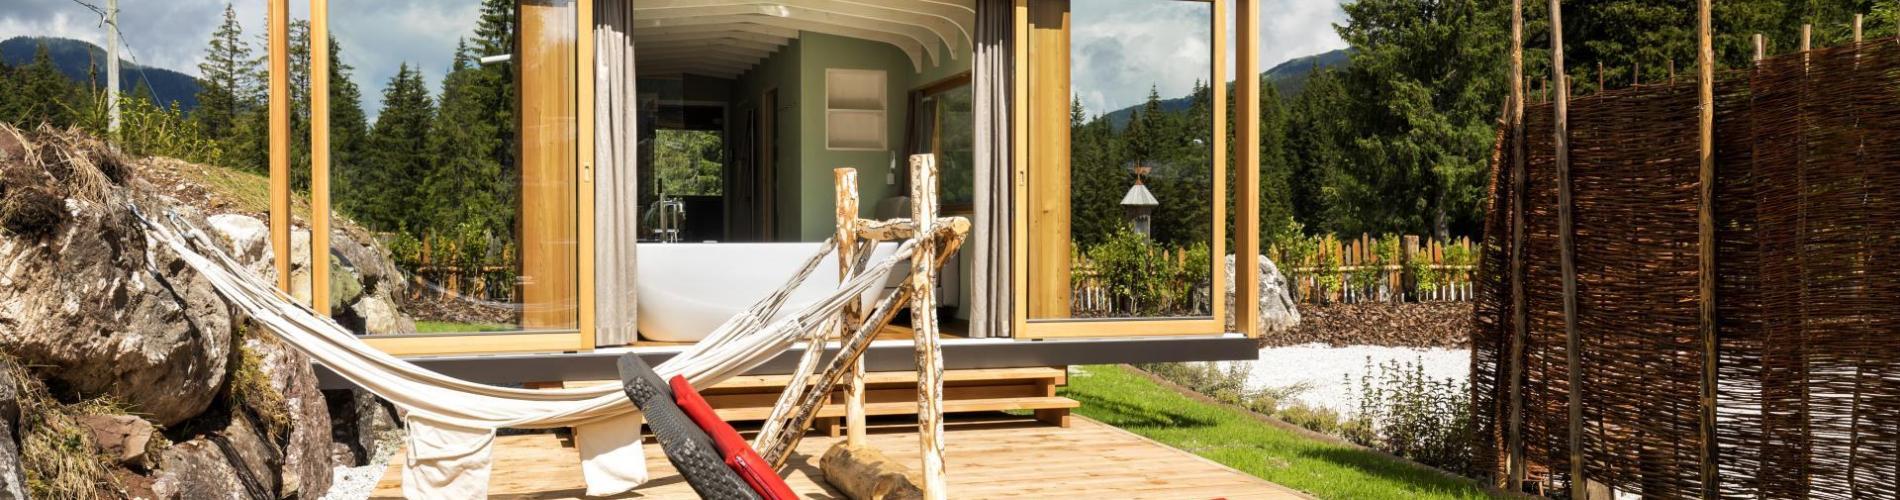 e17cc5797e13d5 Caravan Park Sexten - Camping Südtirol Campingplatz in den Dolomiten